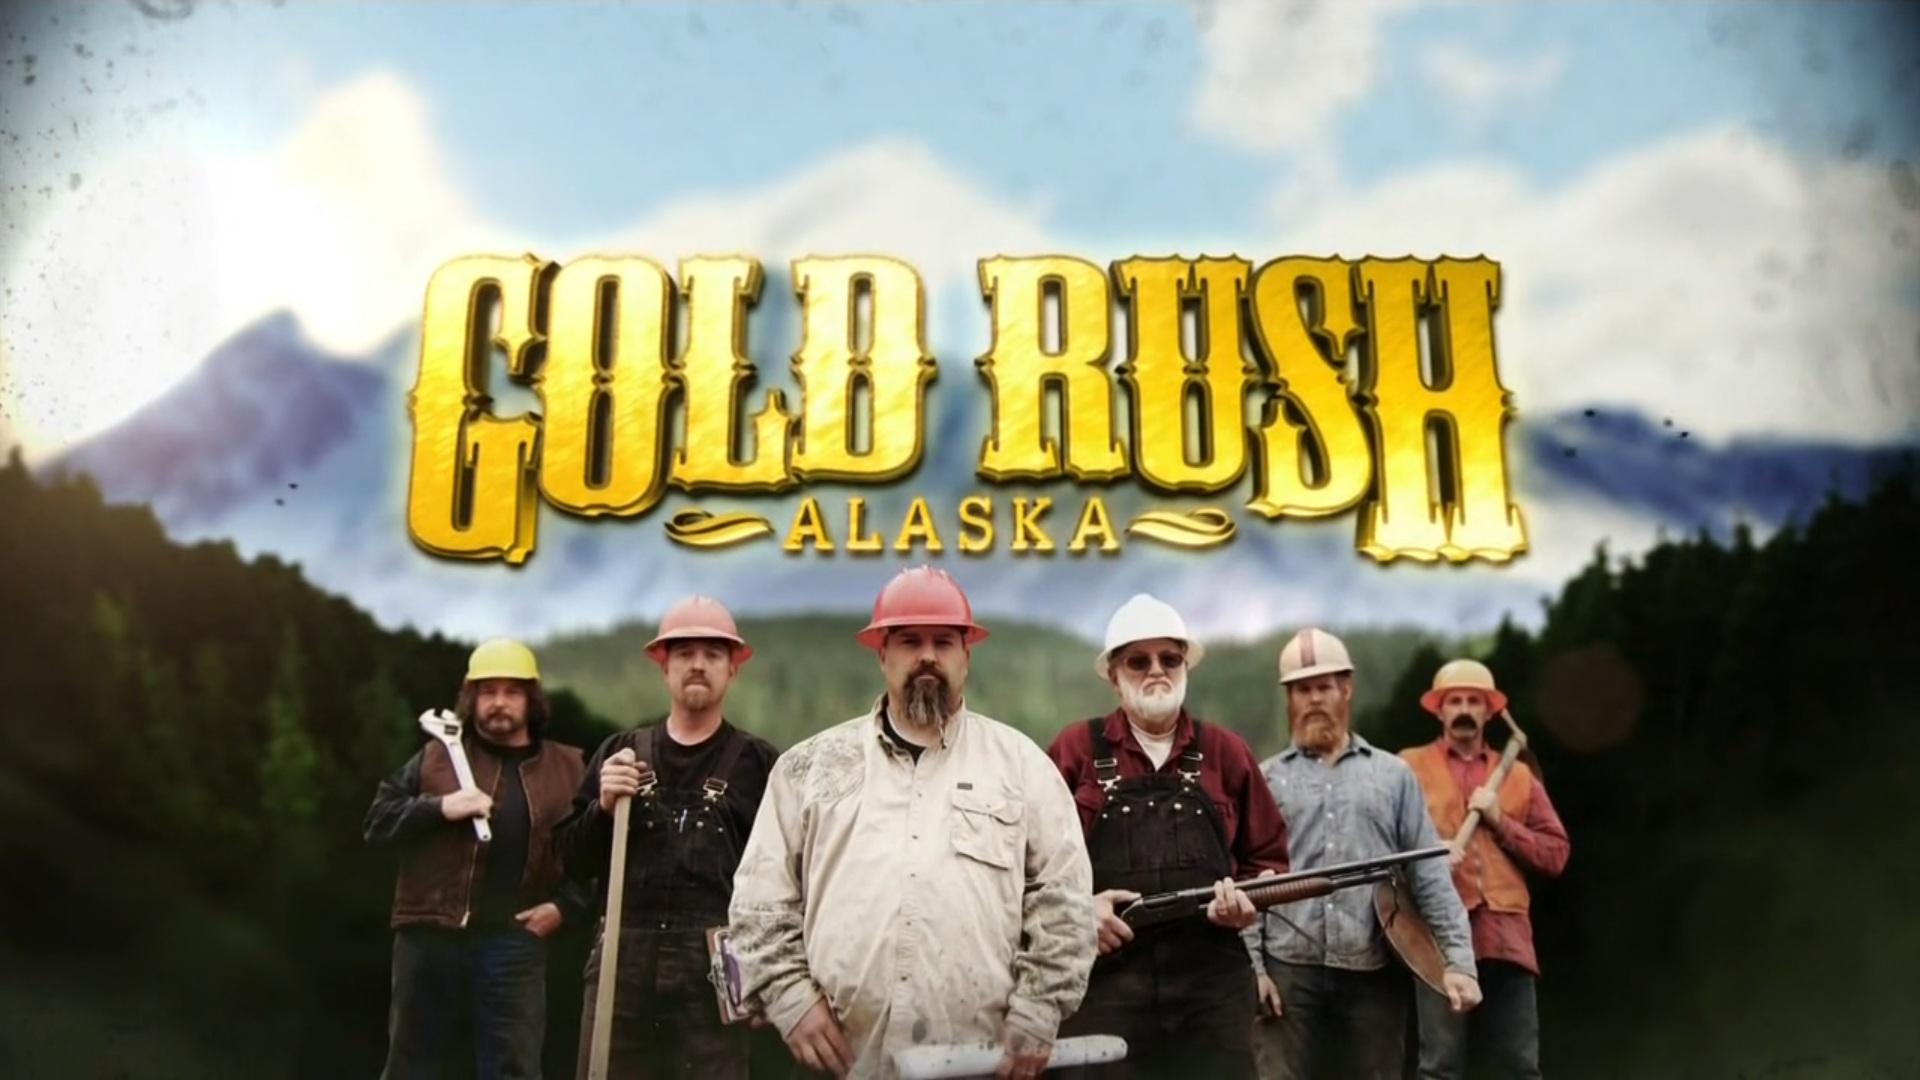 Download Gold Rush Wallpaper Gallery 1920x1080